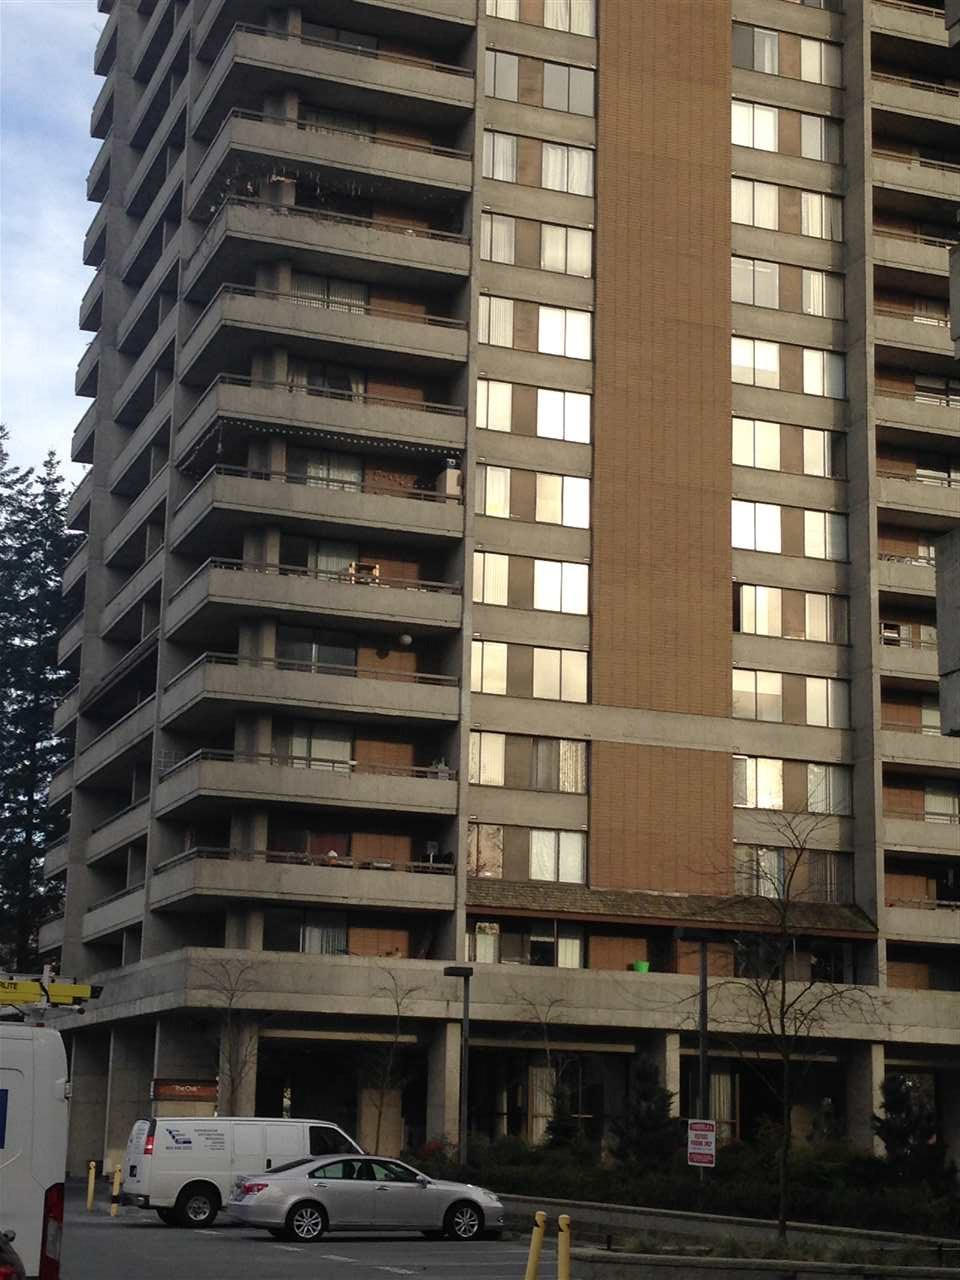 Sold: 2201 - 3755 Bartlett Court, Burnaby, BC